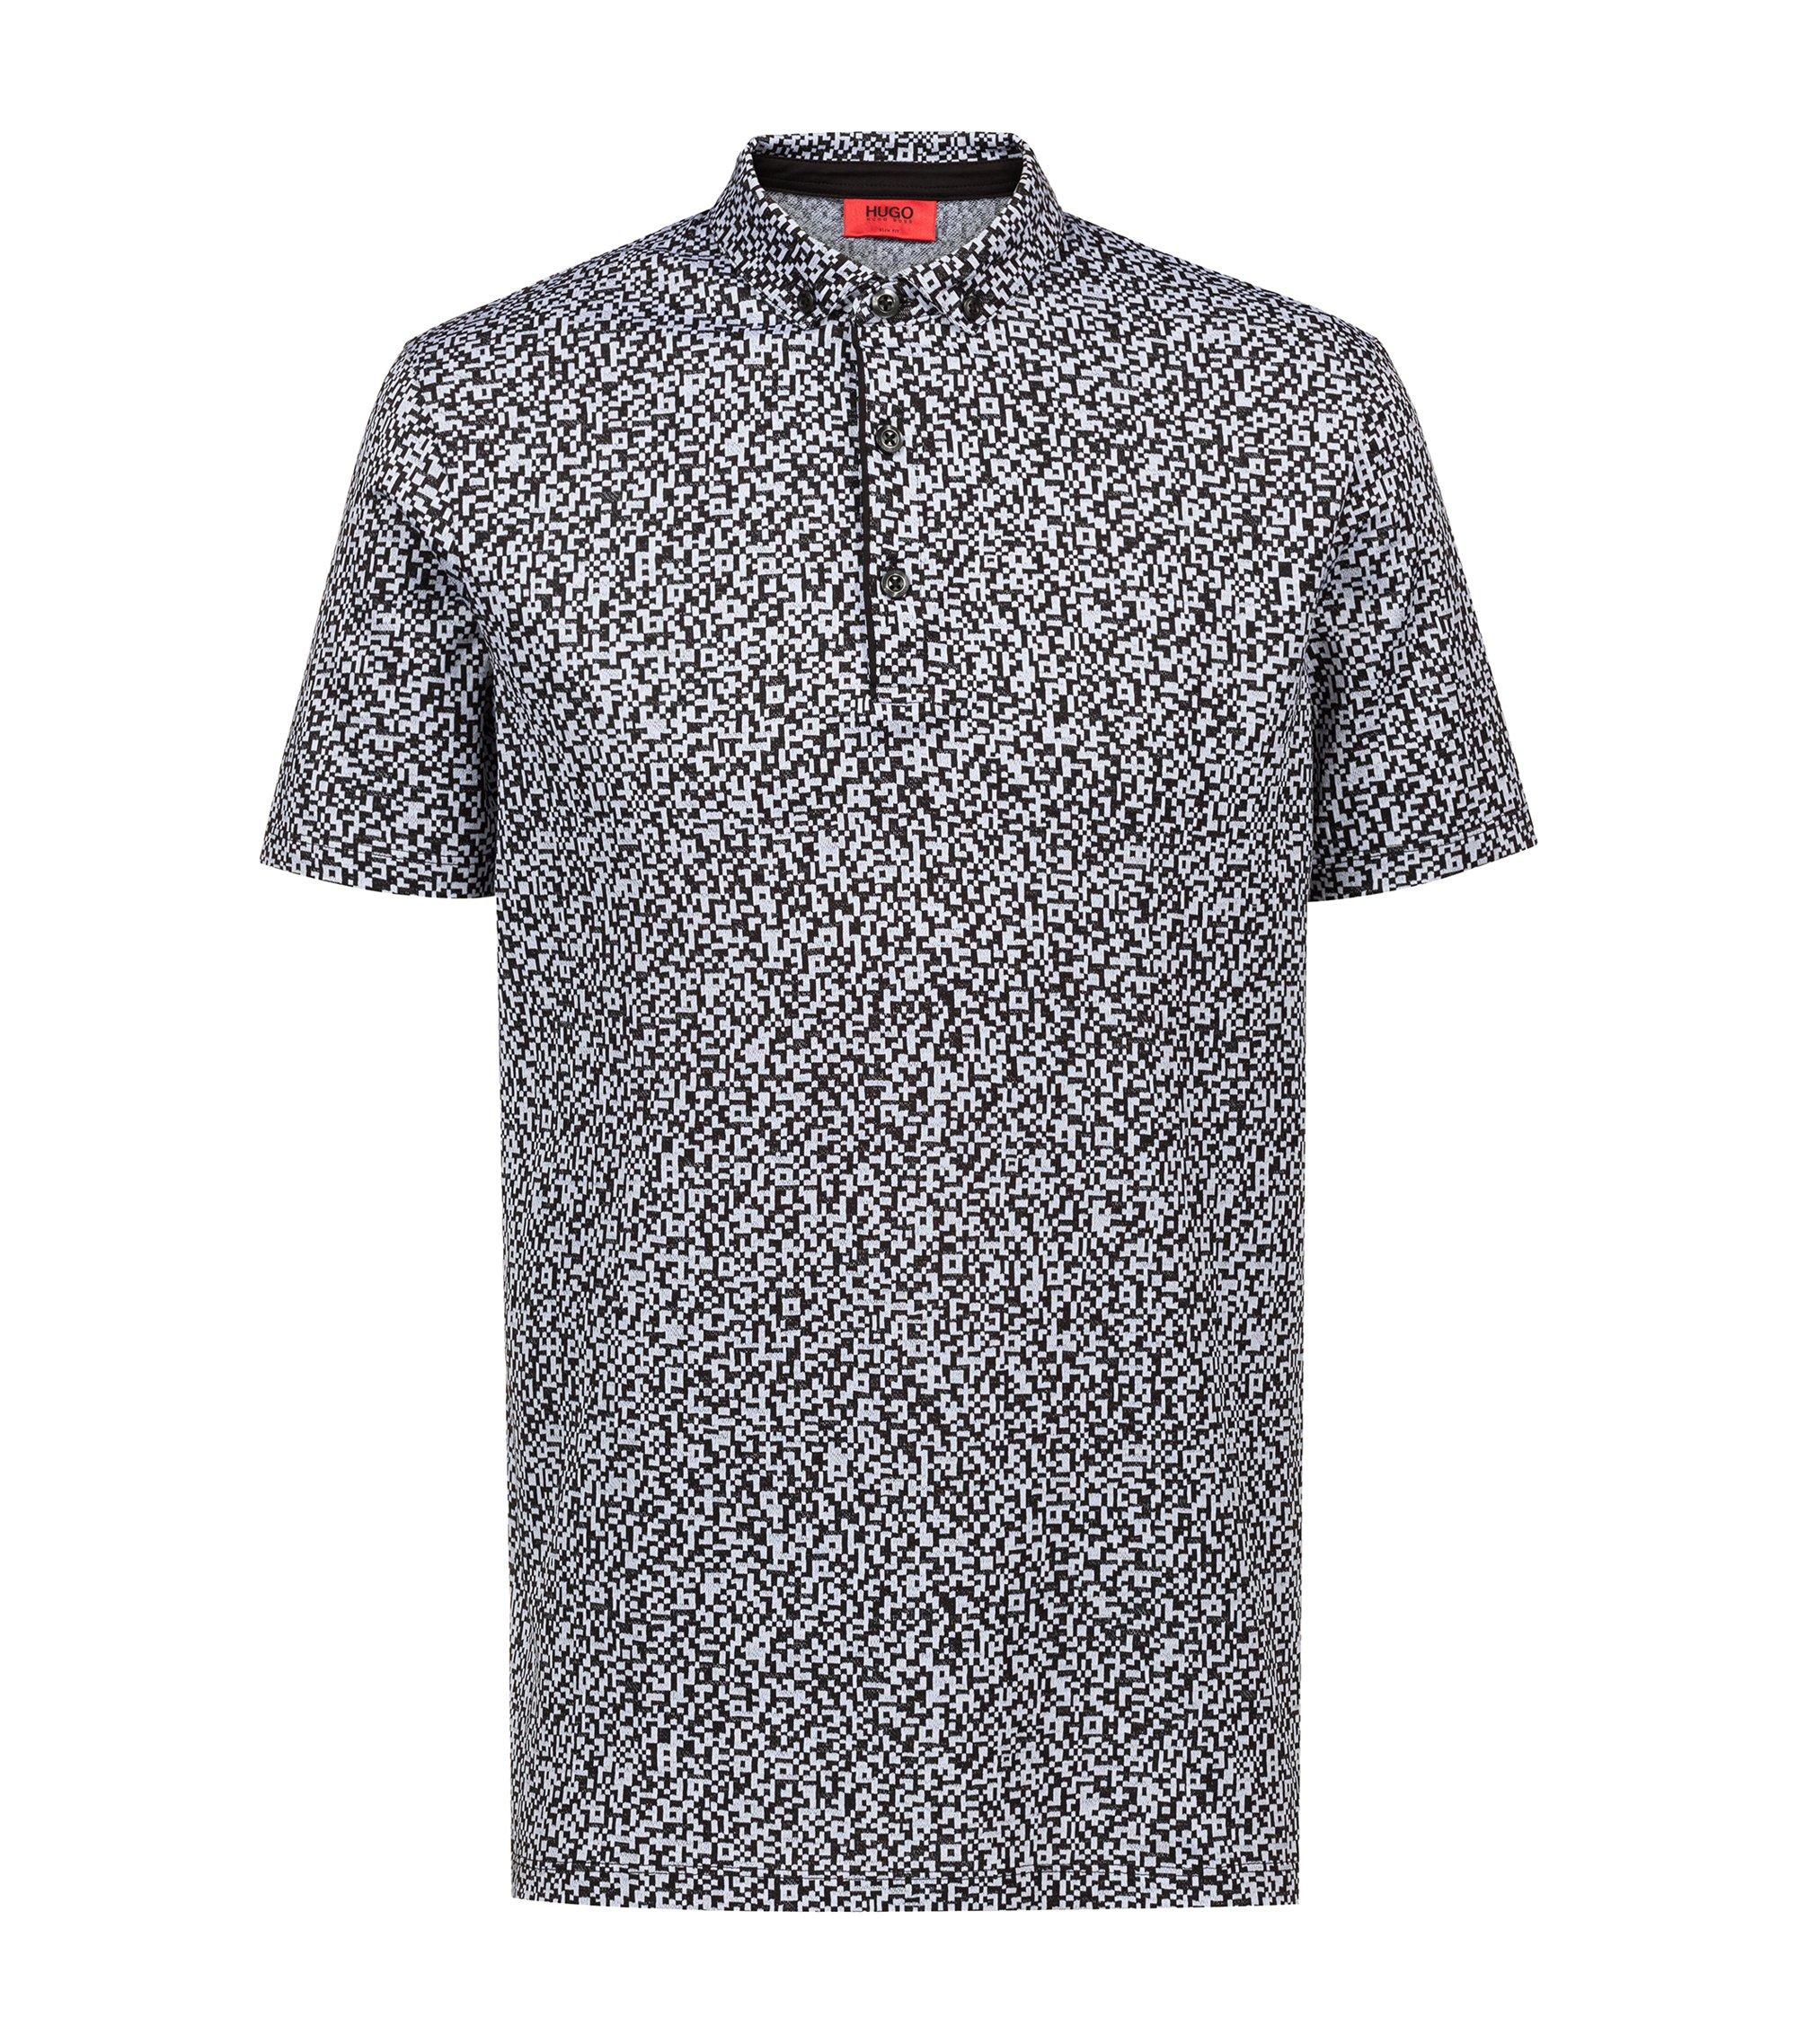 Slim-fit polo shirt in mercerised cotton jacquard, Black